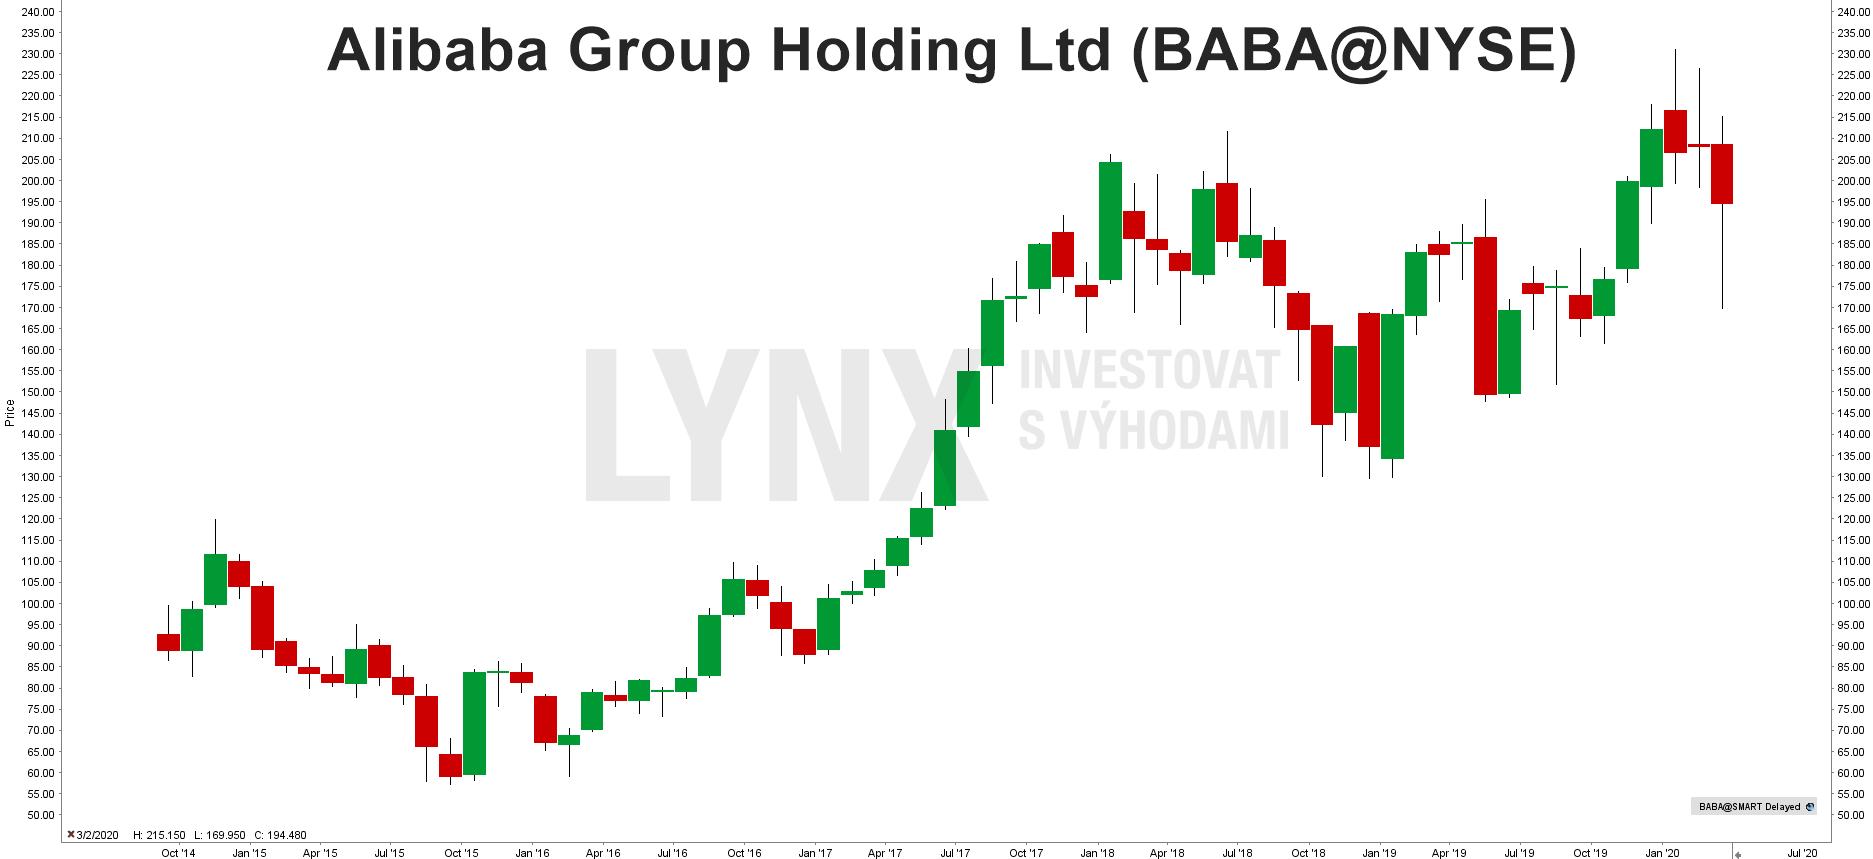 Graf akcie Alibaba Group (BABA)